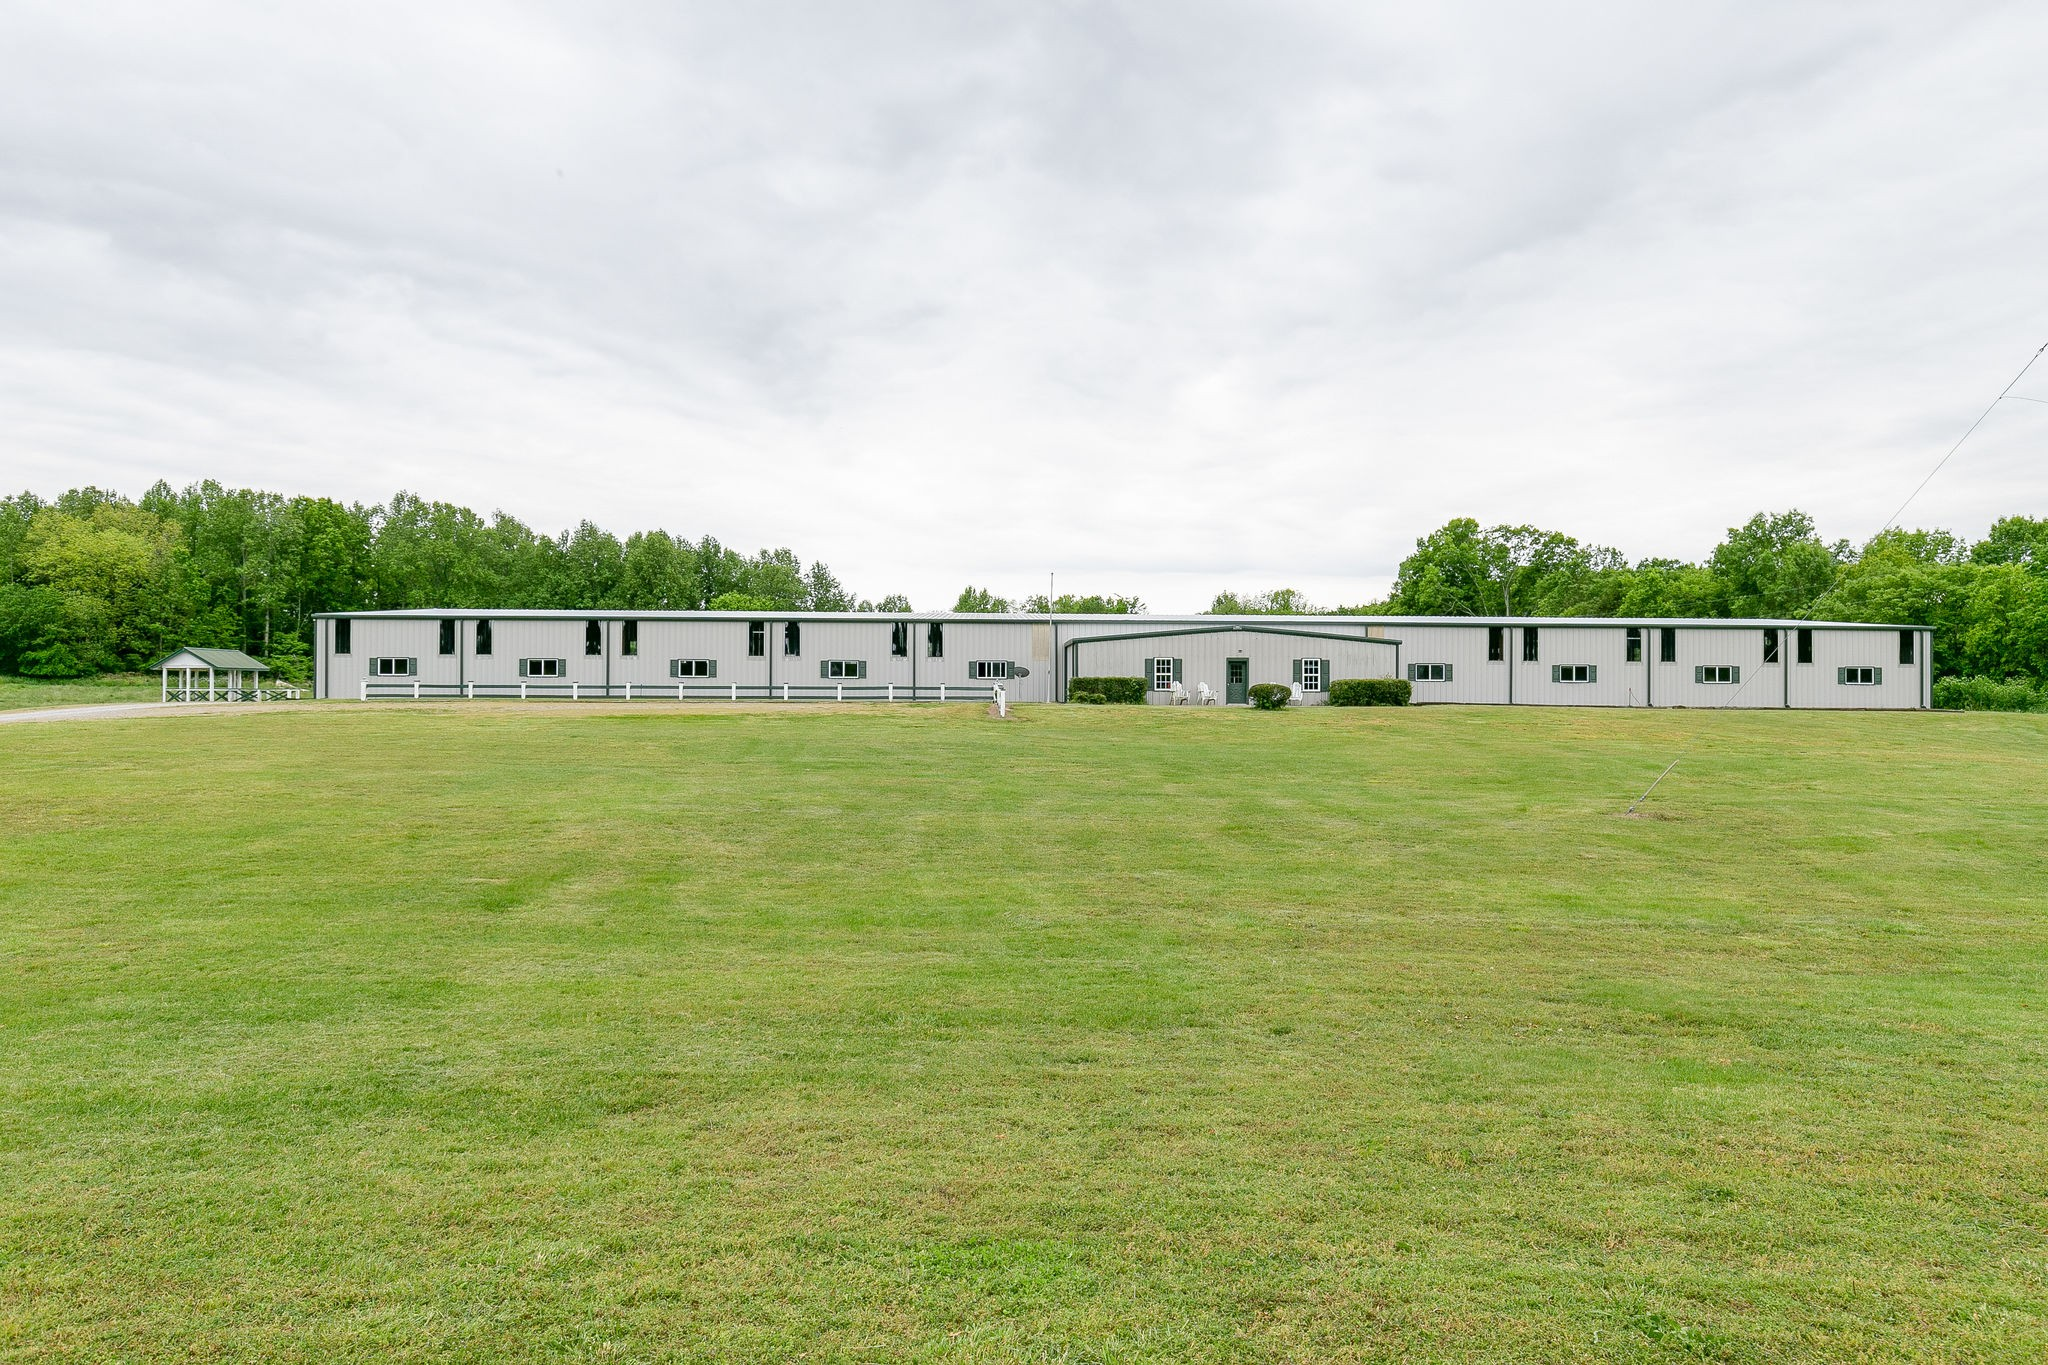 3041 Spring Hill-Duplex Rd, Spring Hill, TN 37174 - Spring Hill, TN real estate listing